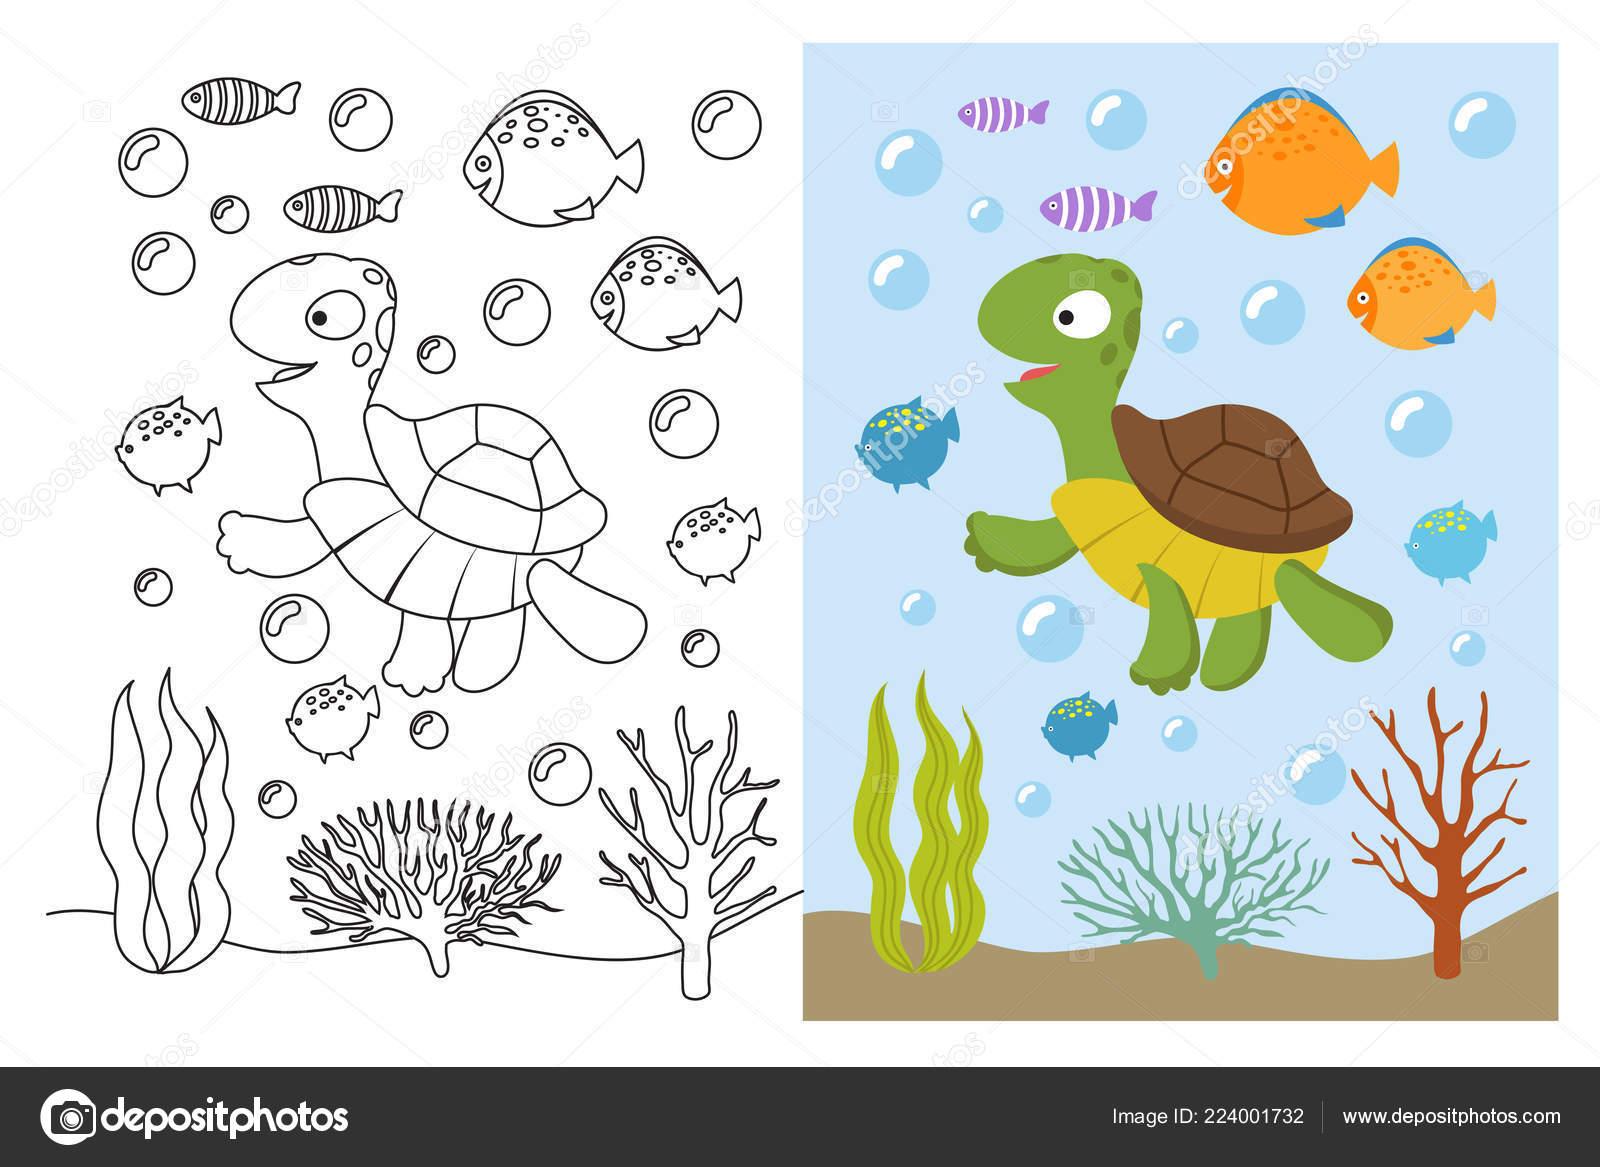 Kleurplaten Dieren Onder Water.Turtle Kleurplaten Cartoon Zeedieren Onderwater Zwemmen